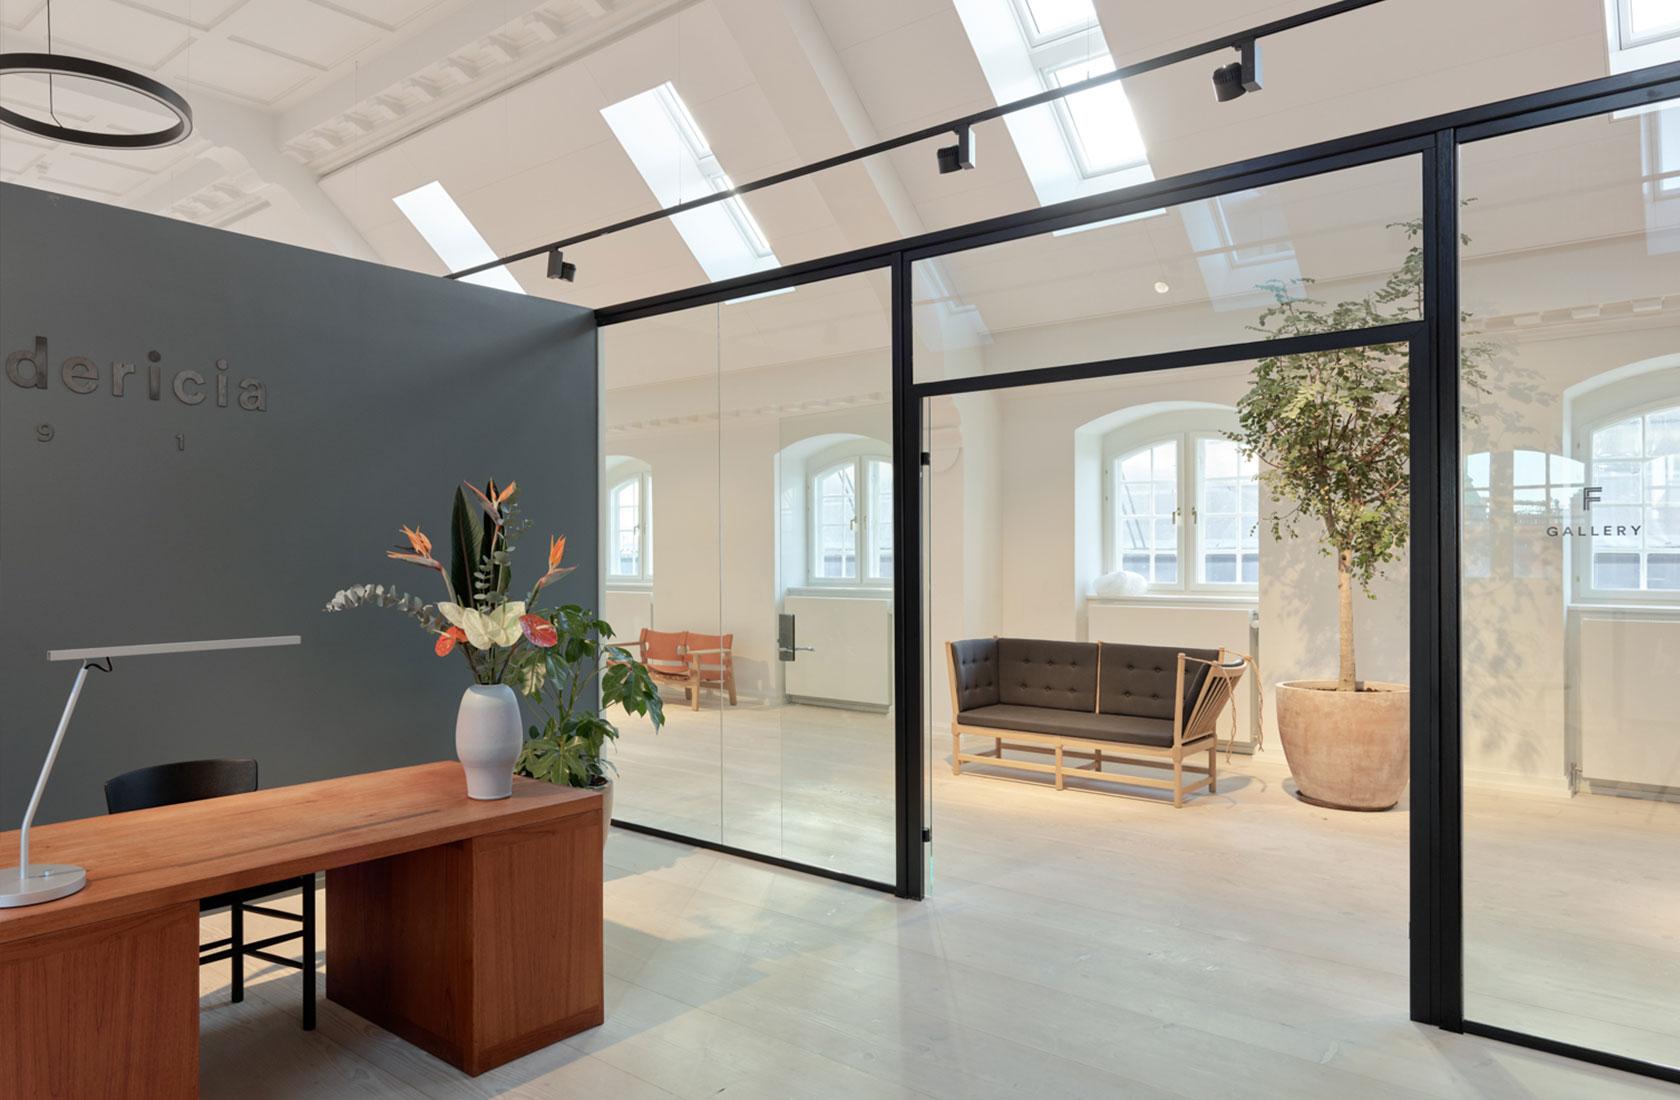 Fredericia Furnitures receptionsområde